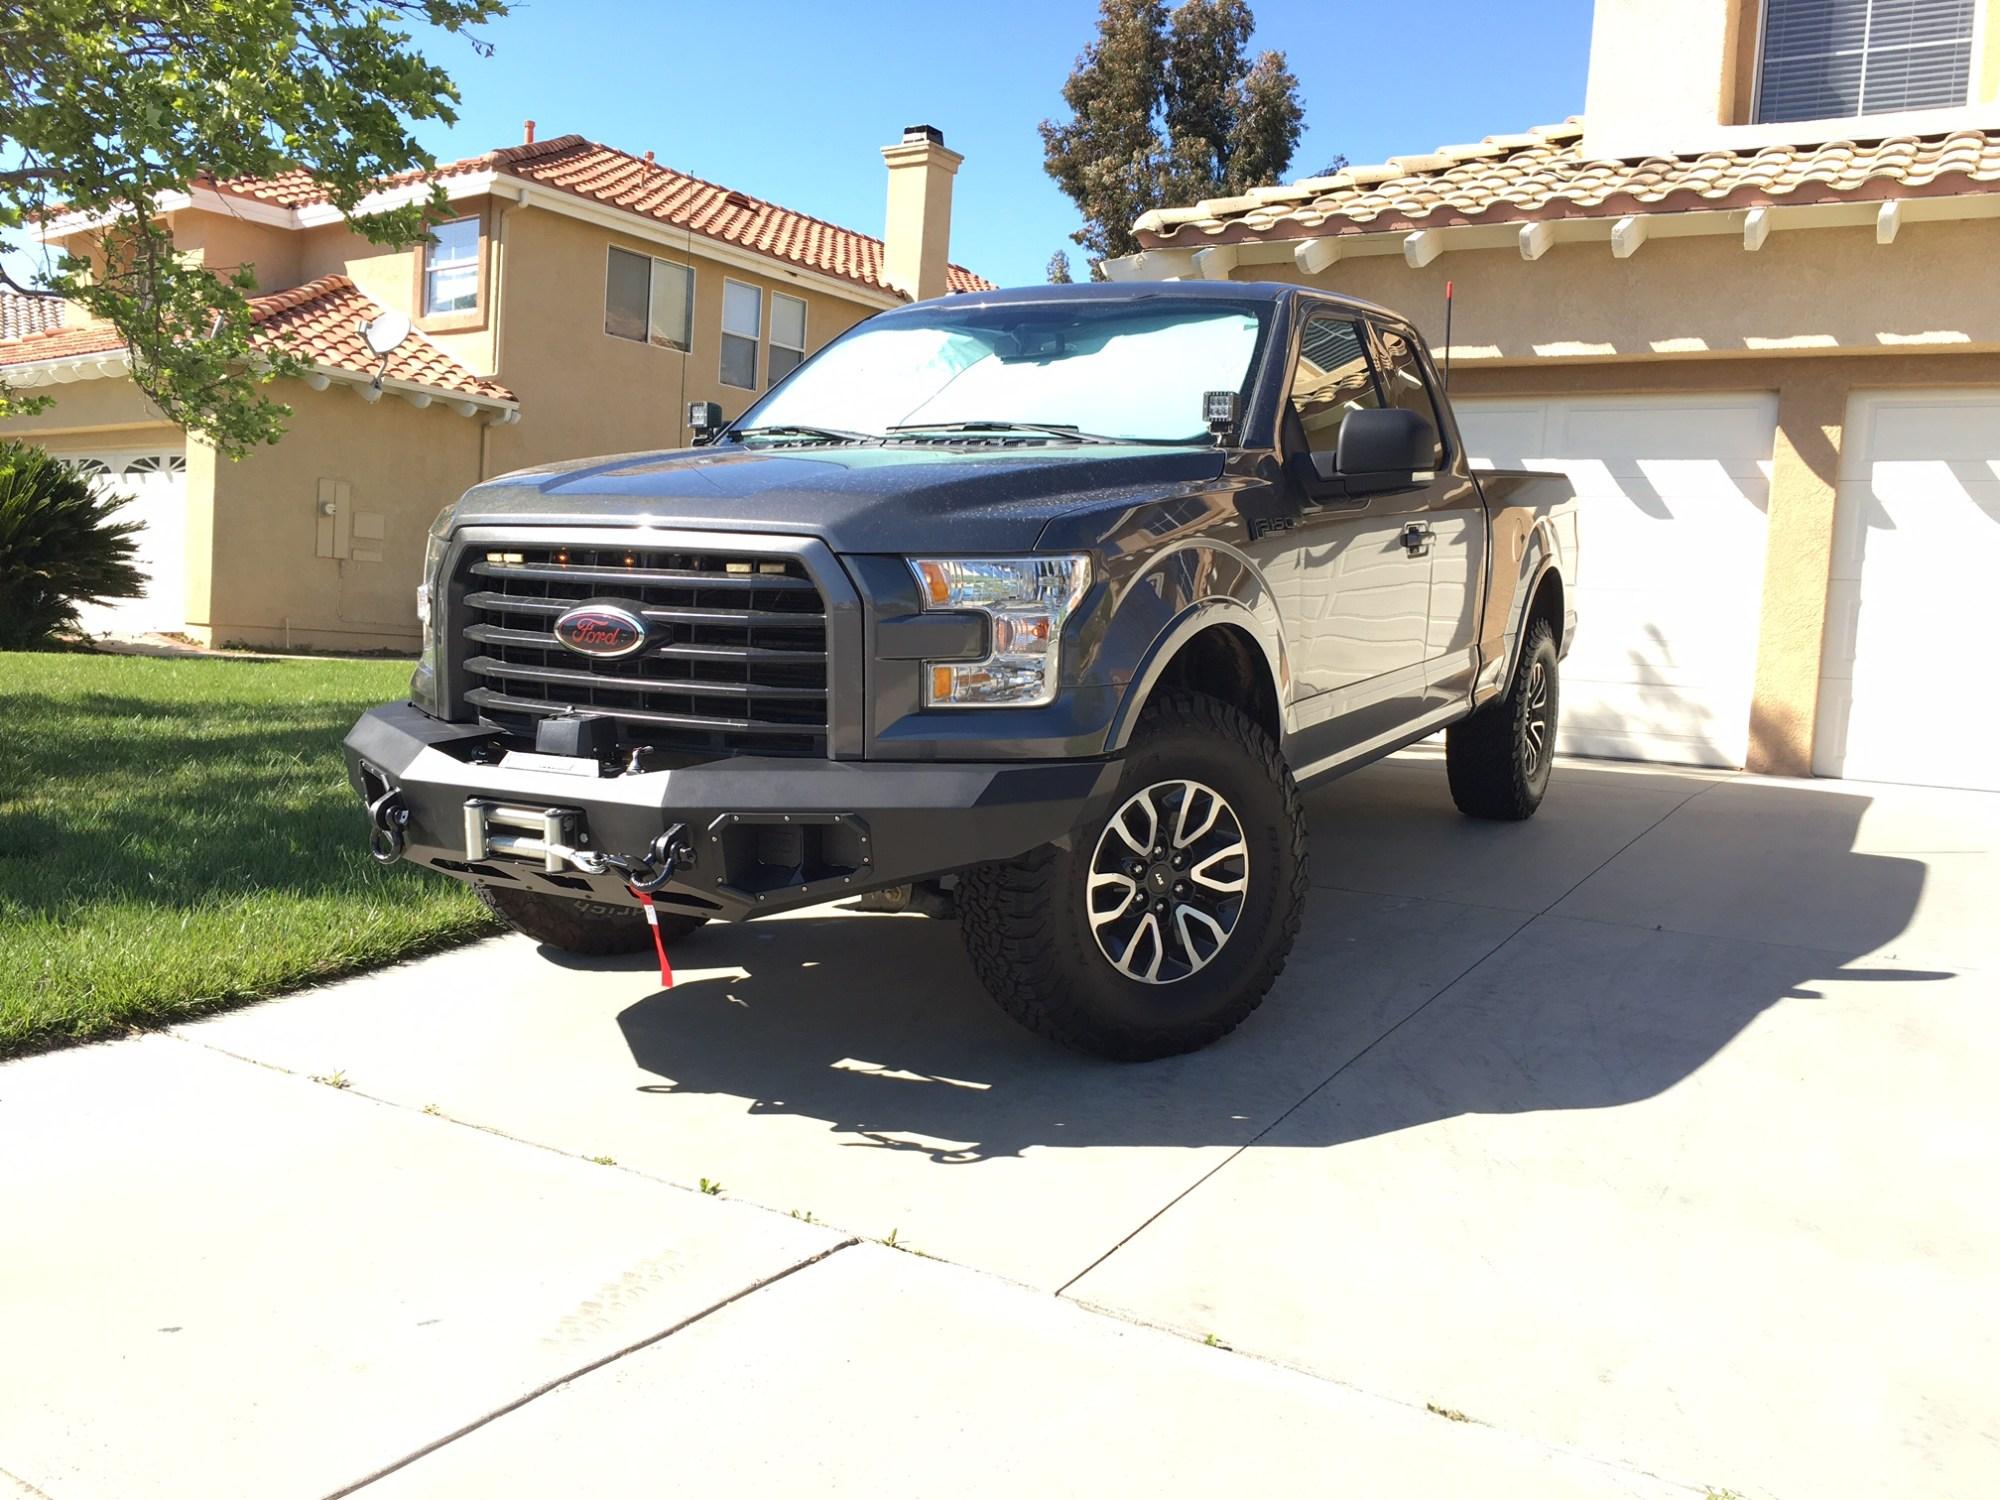 hight resolution of  warn winch bumper installed img 9435 jpg